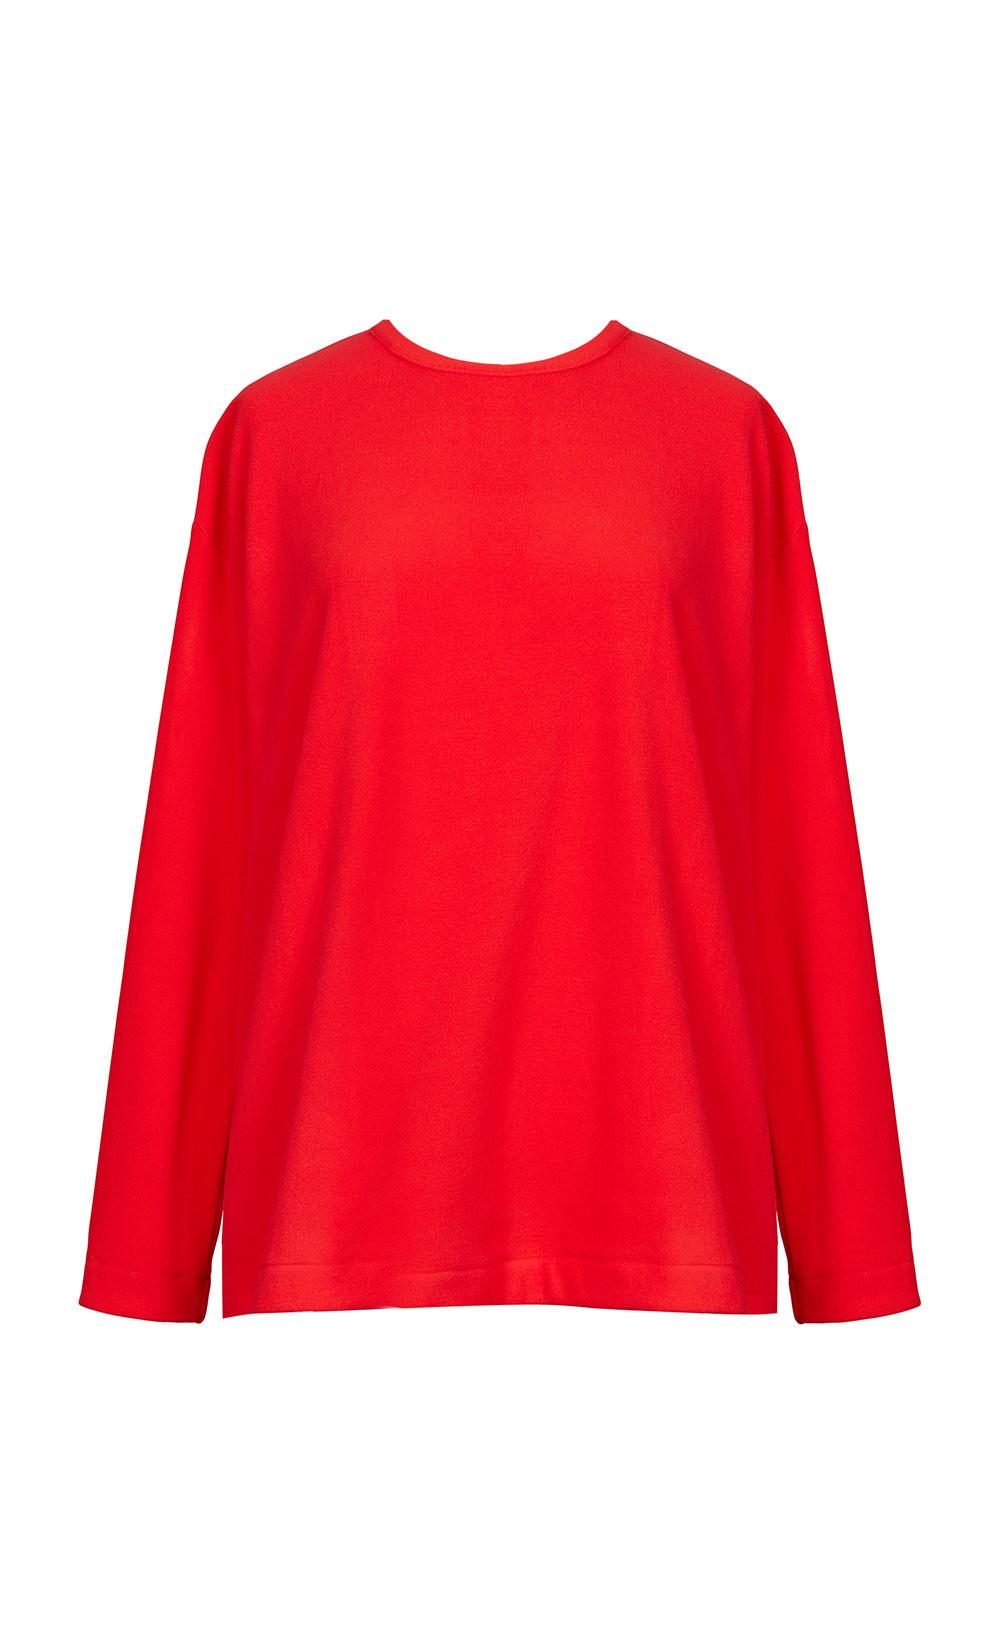 Etam Fleece Sweatshirt